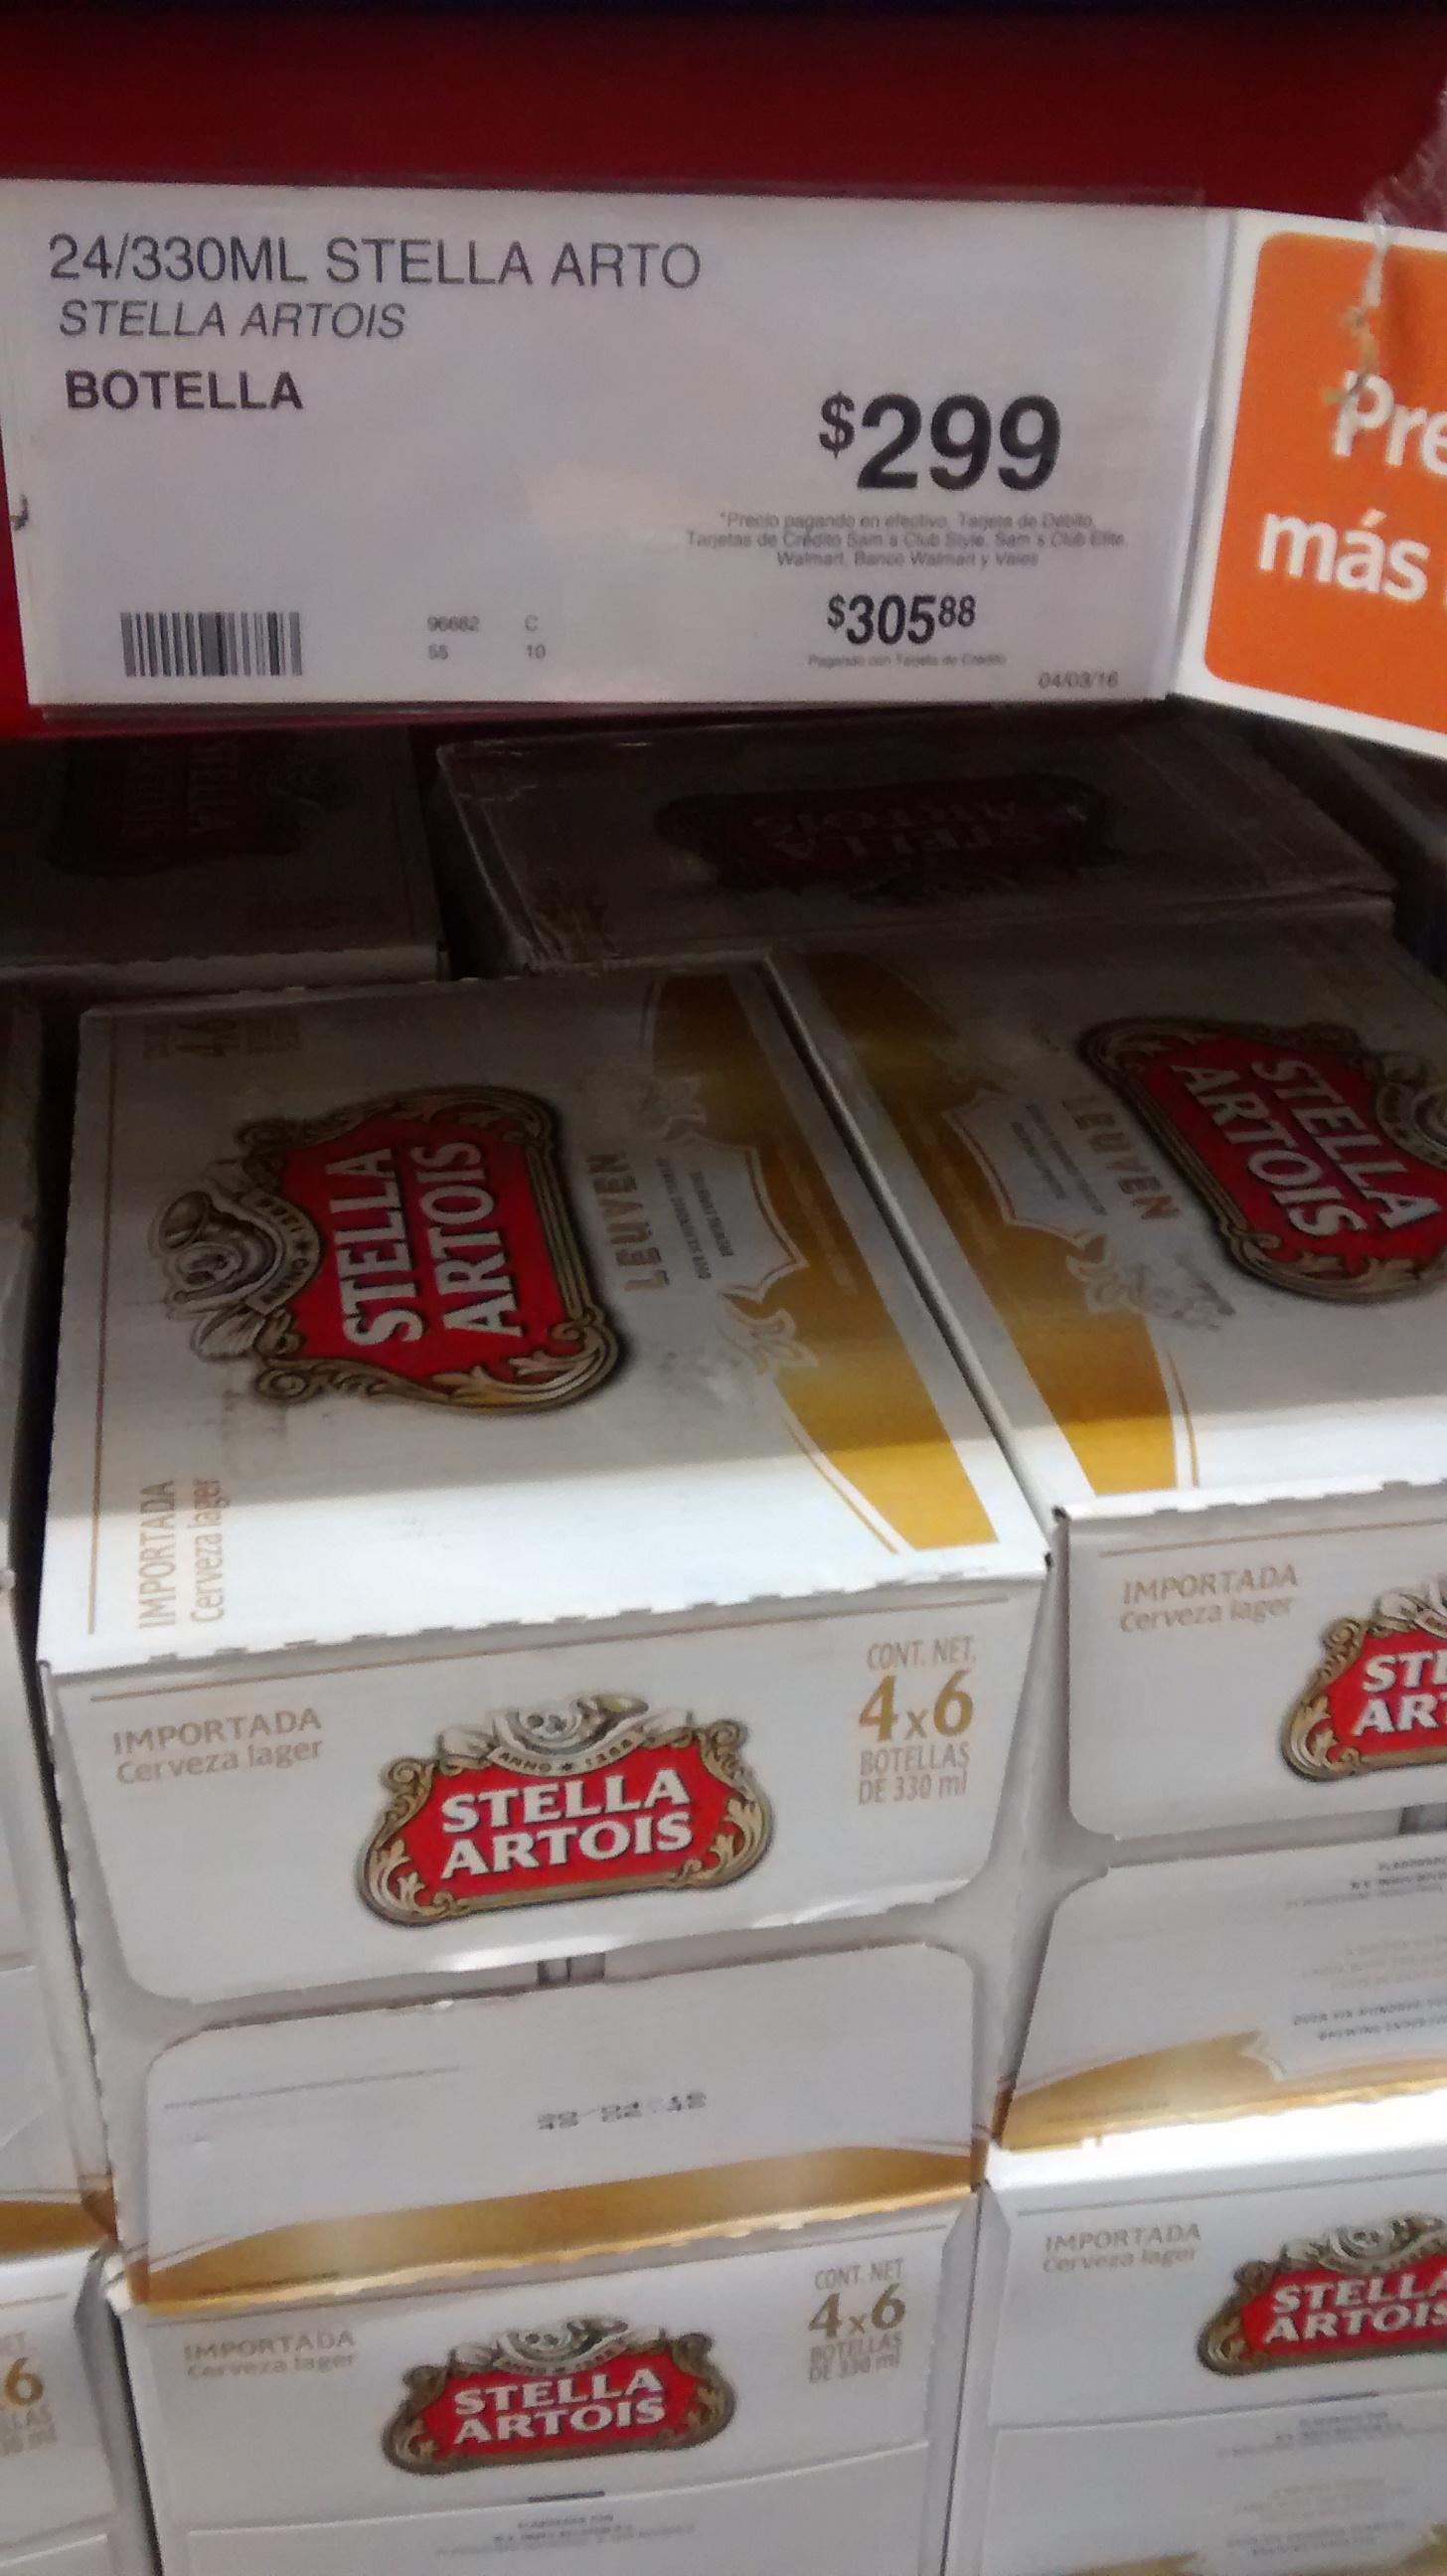 Sam's Club Galerias Aguascalientes: cerveza Stella Artois en oferta $299 cartón de 24